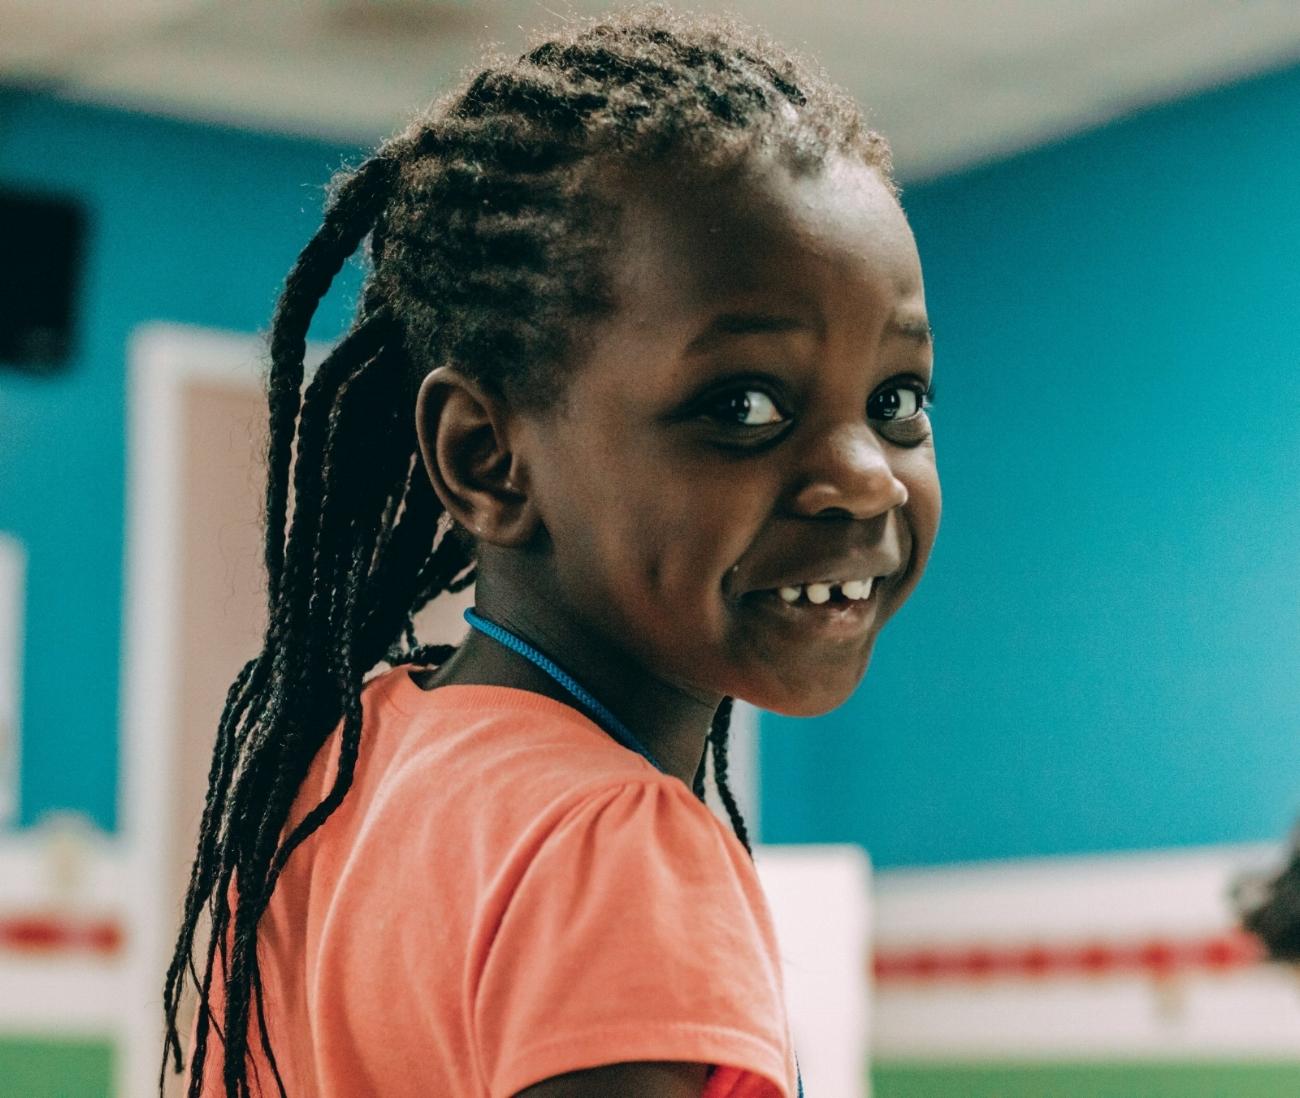 Clarkston Music Camp 2018 little girl.JPG